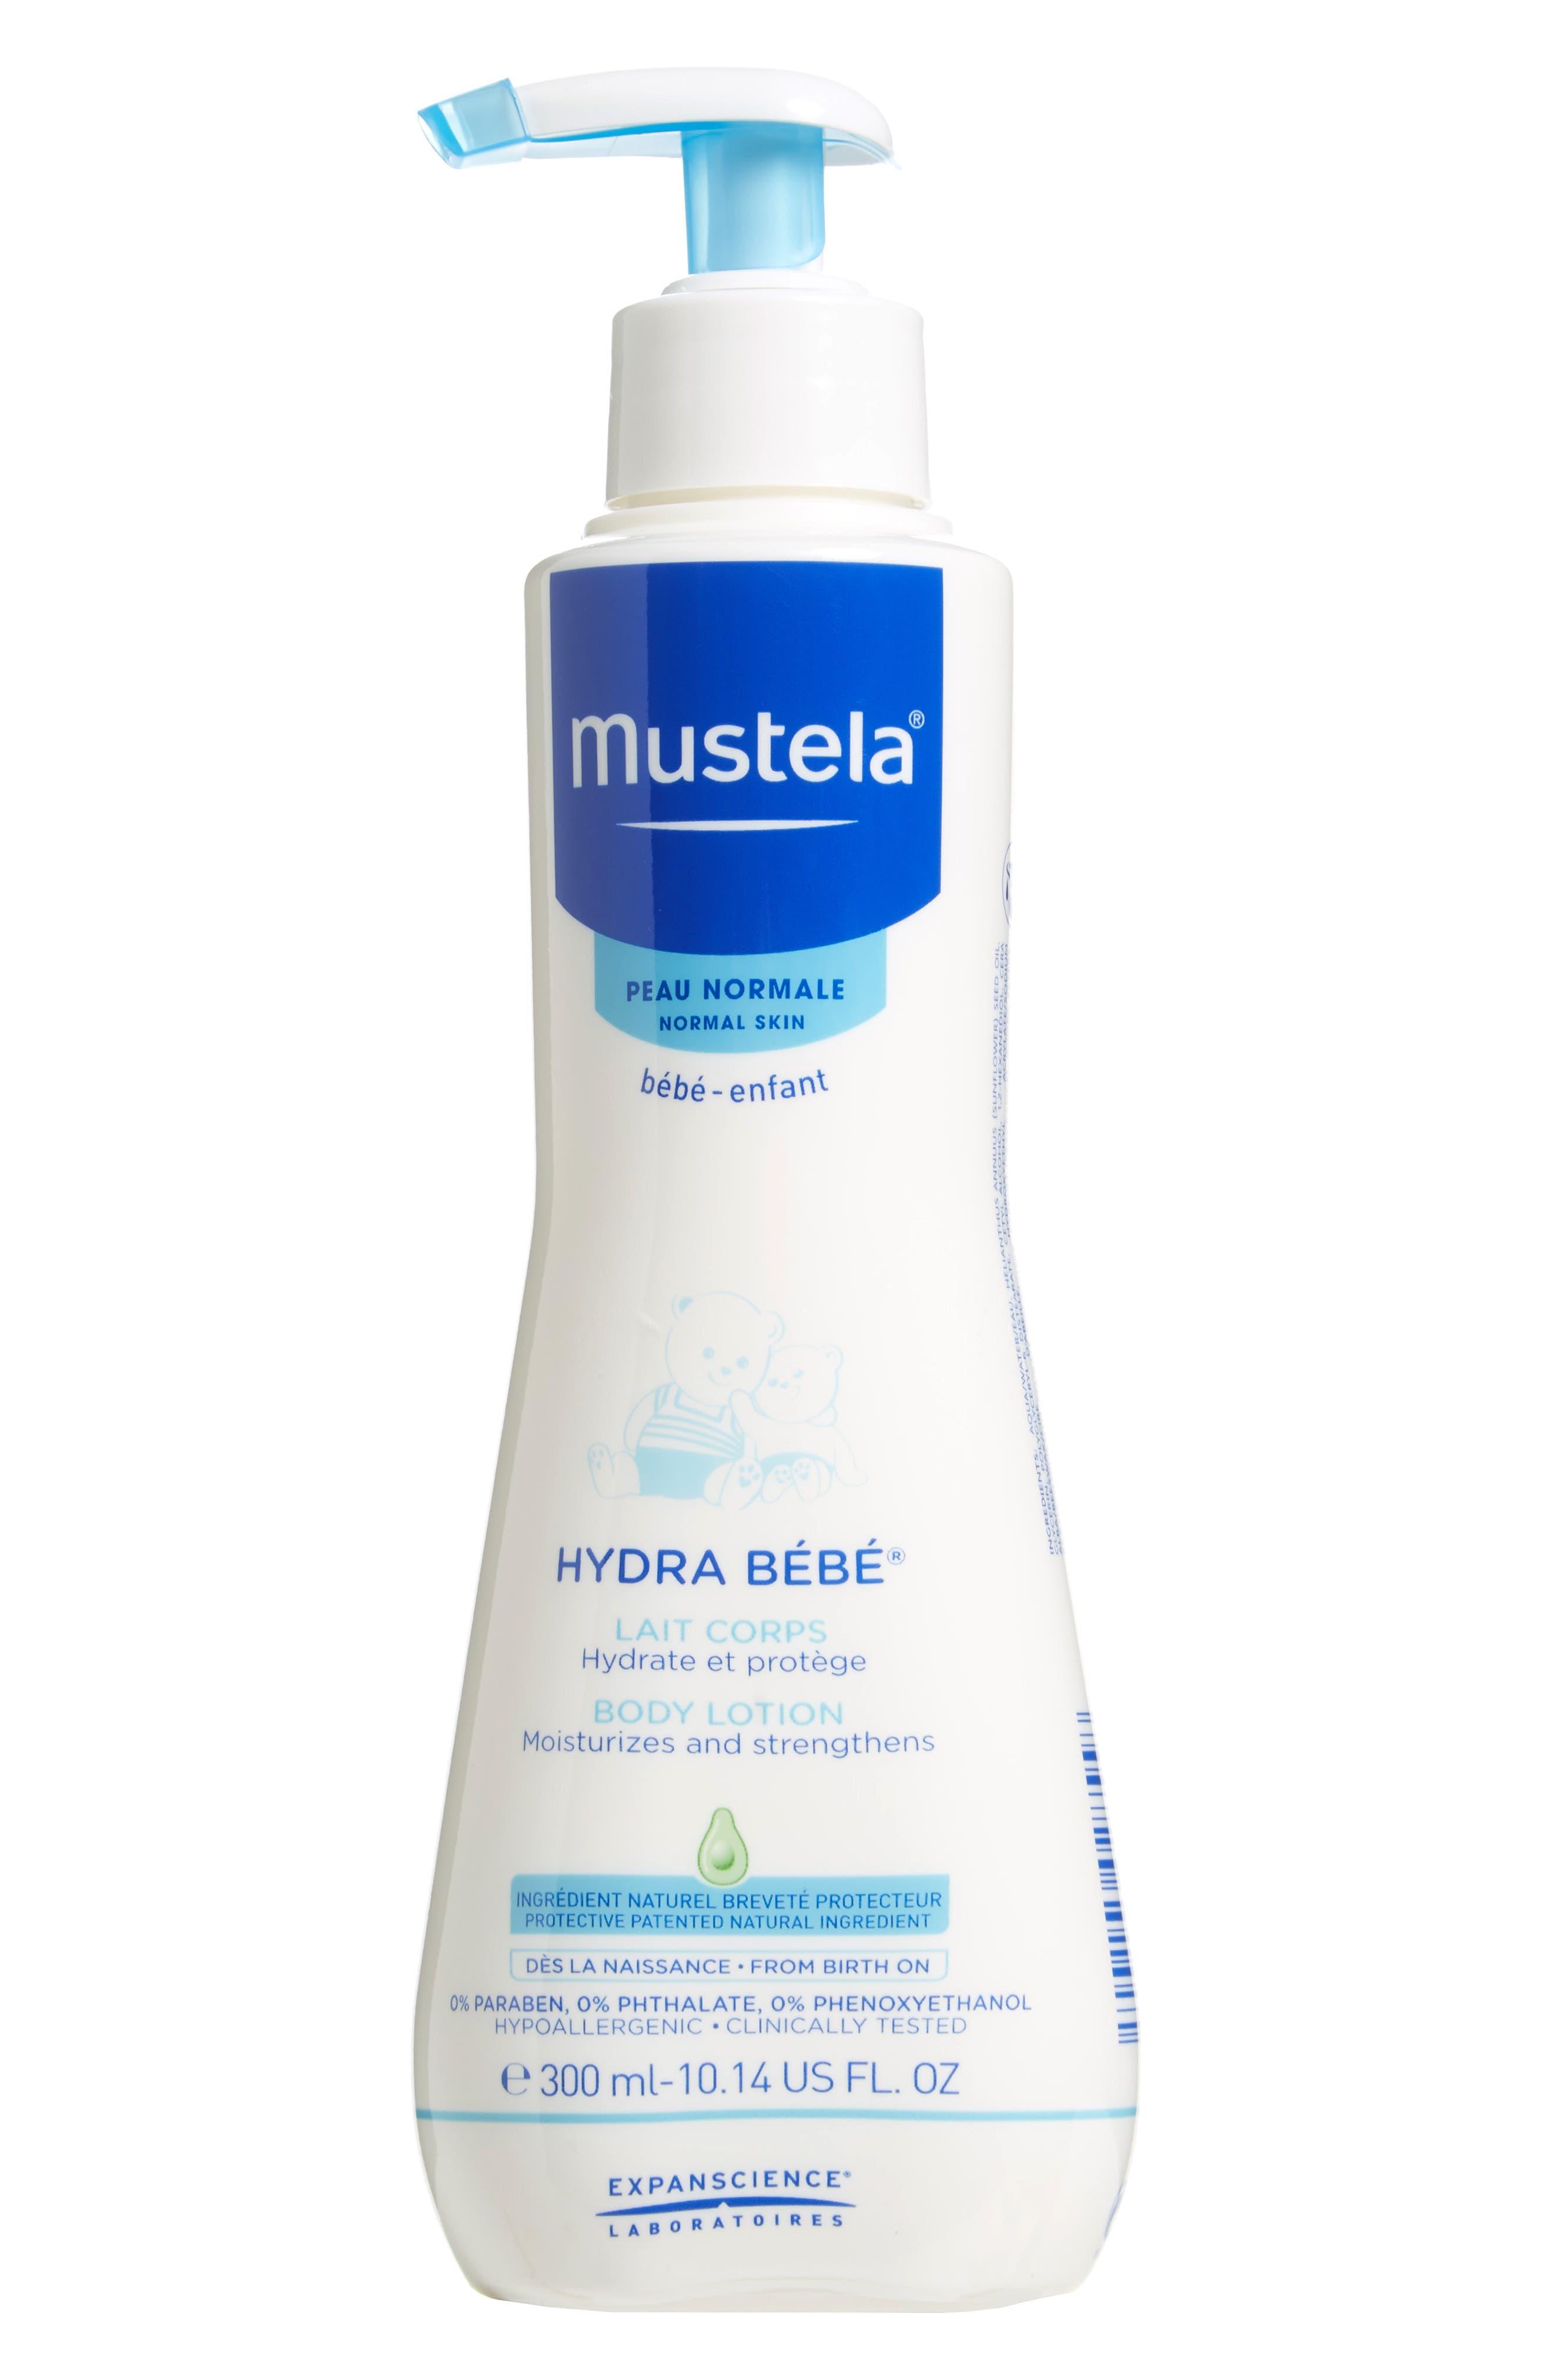 Mustela® Hydra Bébé® Body Lotion